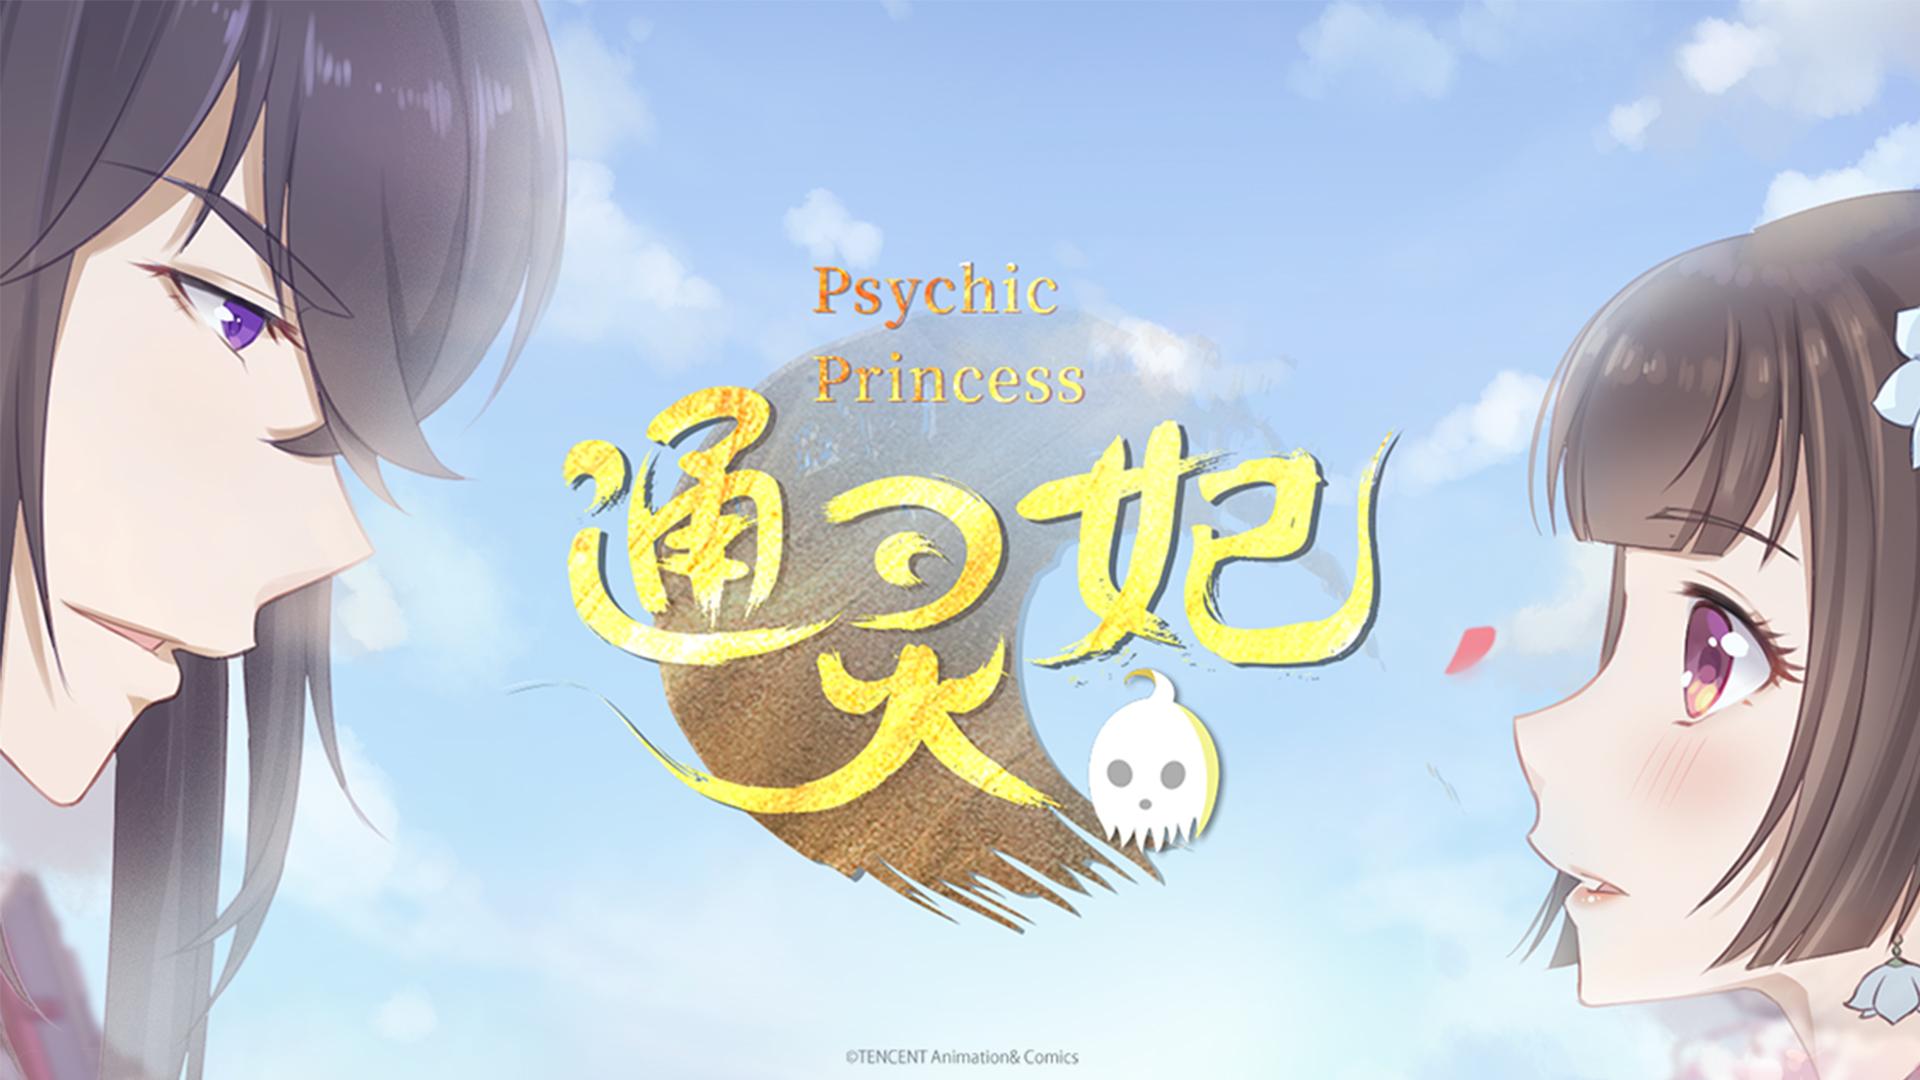 Psychic Princess